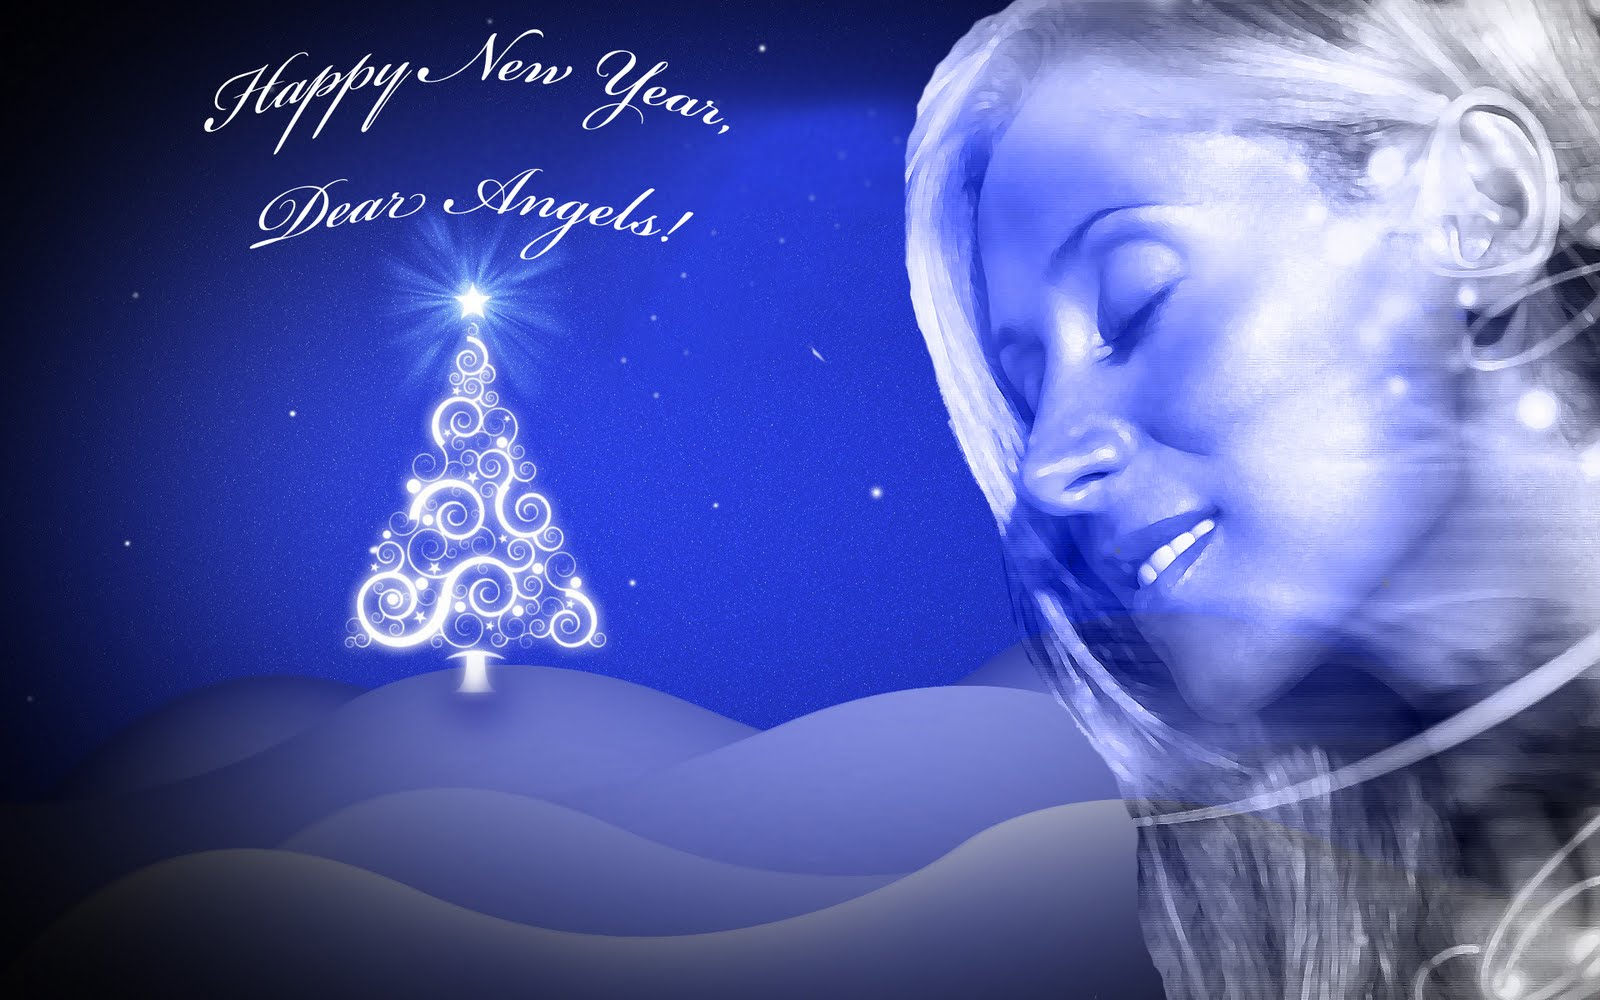 http://2.bp.blogspot.com/_dd3-Qan8Jfc/TR3agdJB19I/AAAAAAAAACo/YZMtGUaYh3A/s1600/Happy%2BNew%2BYear%2521.jpg